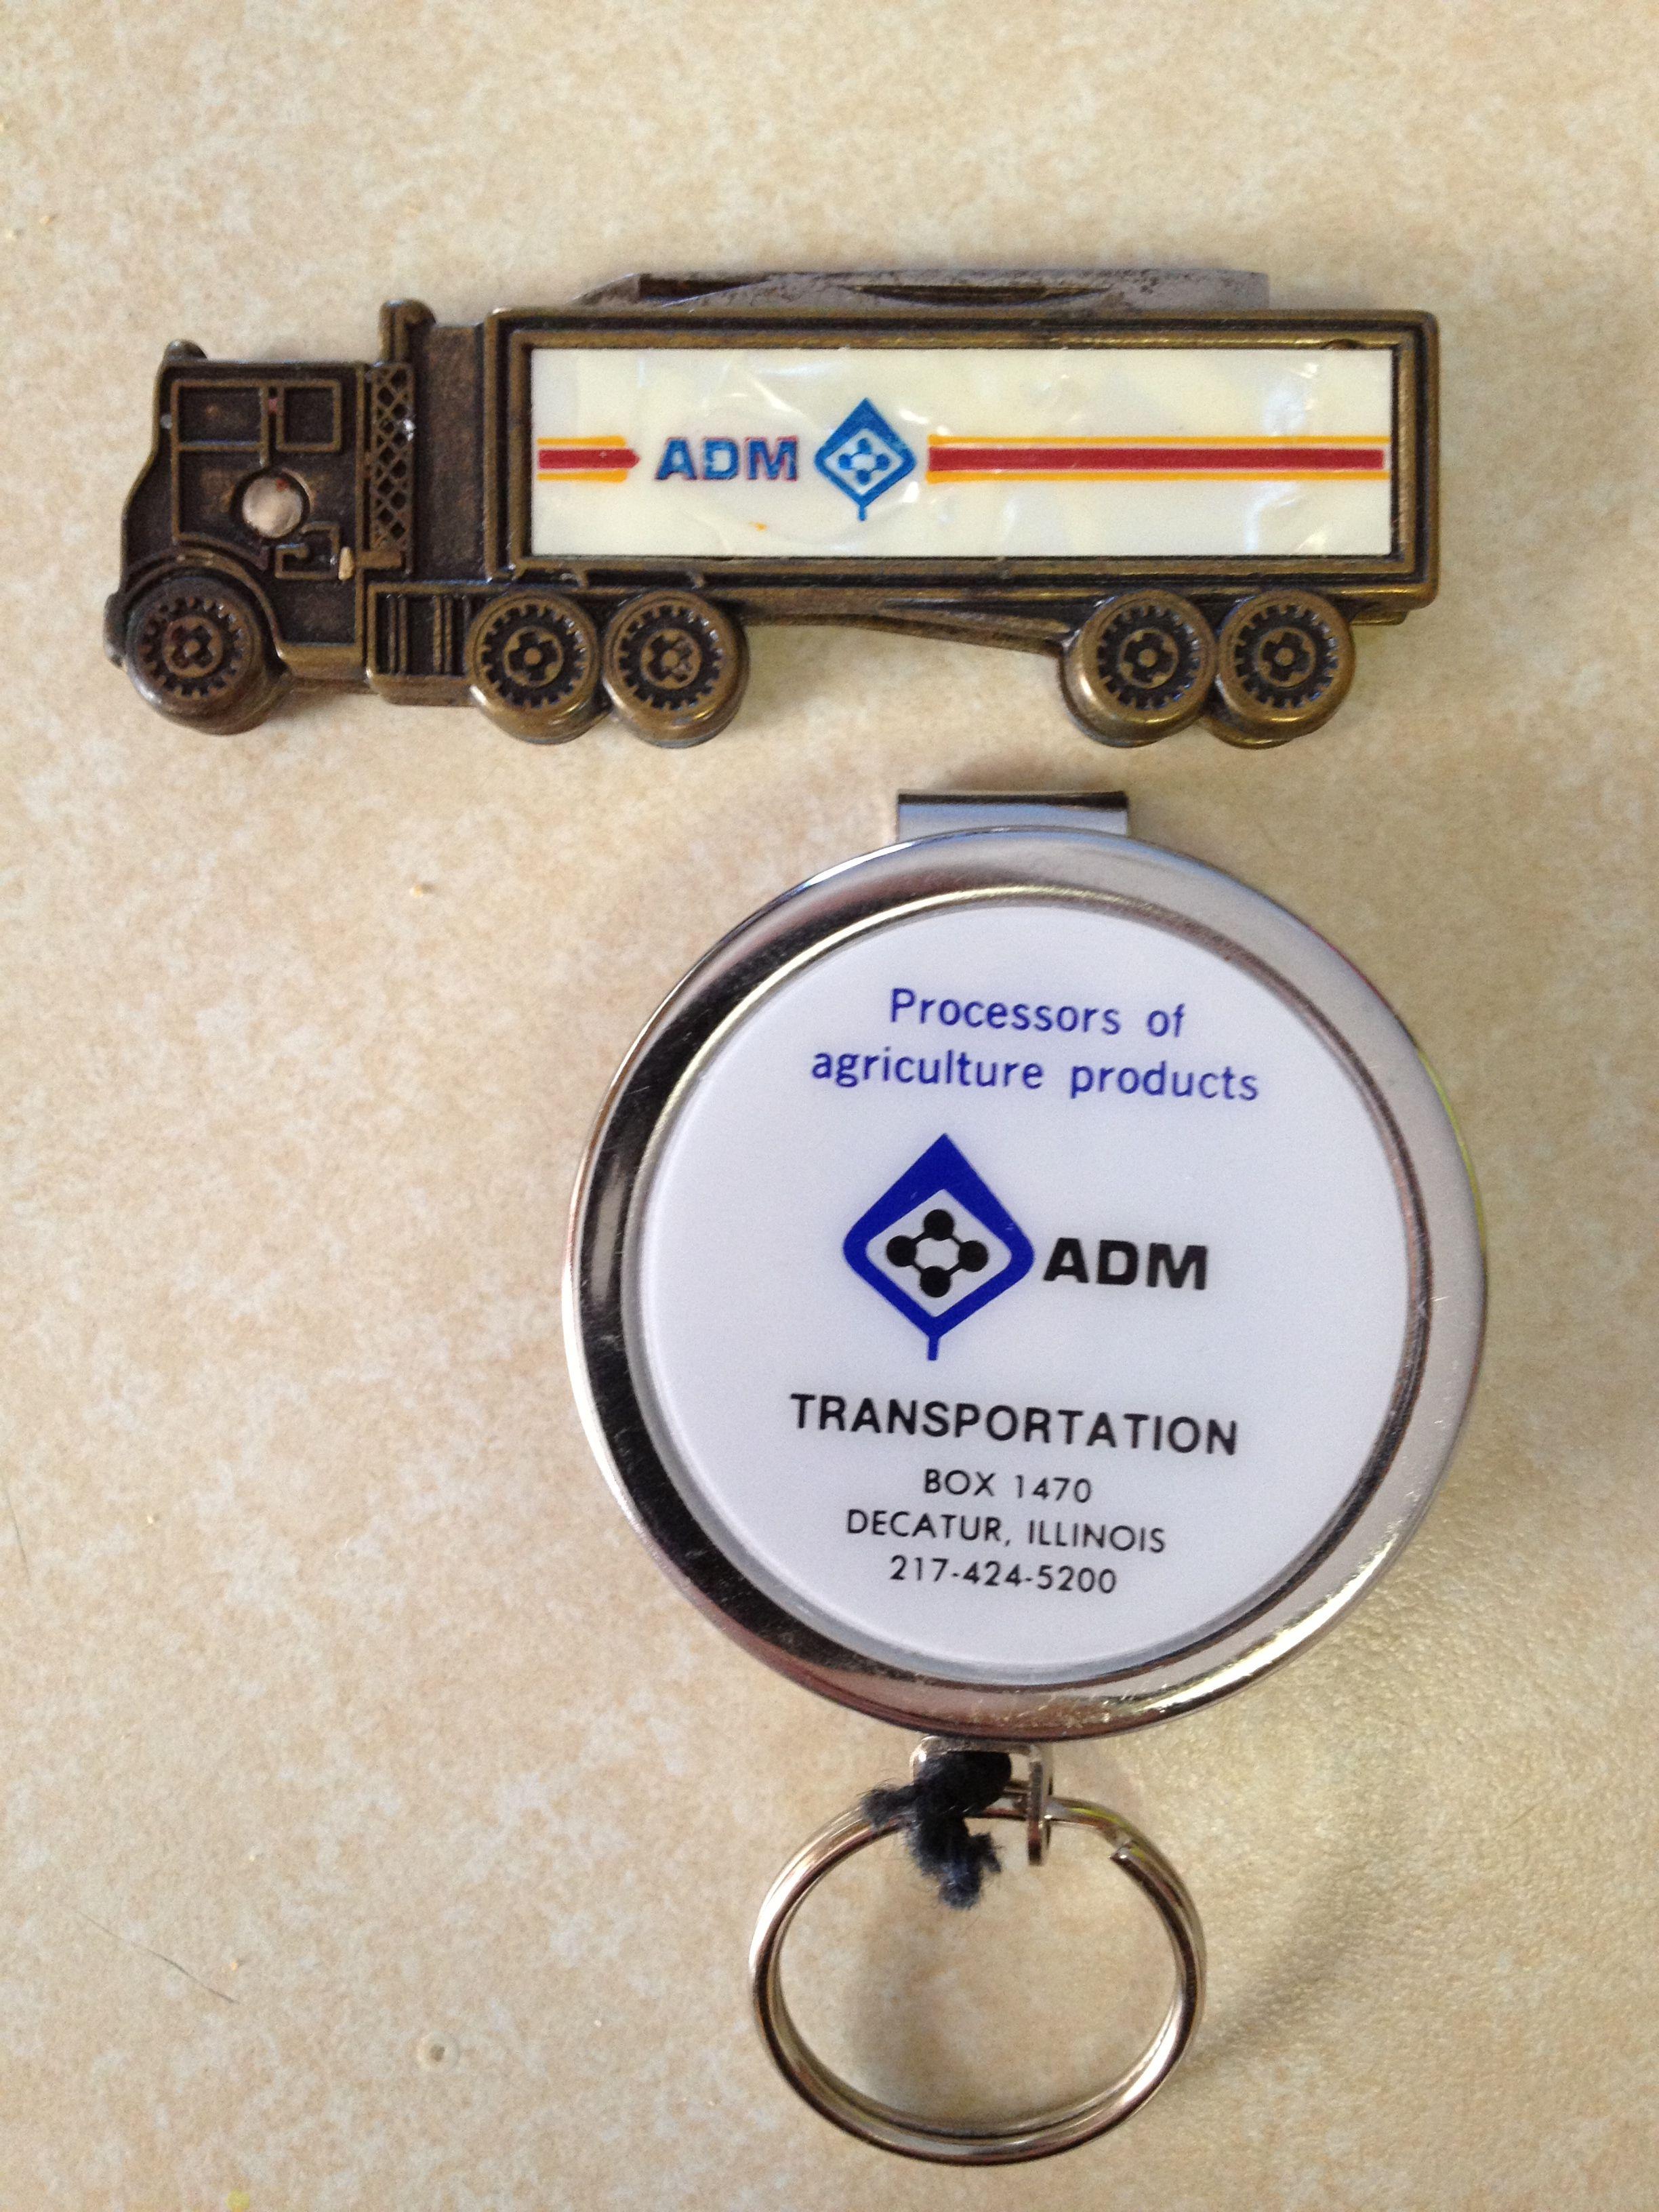 pocket knife and key holder; ADM Transportation; ADM